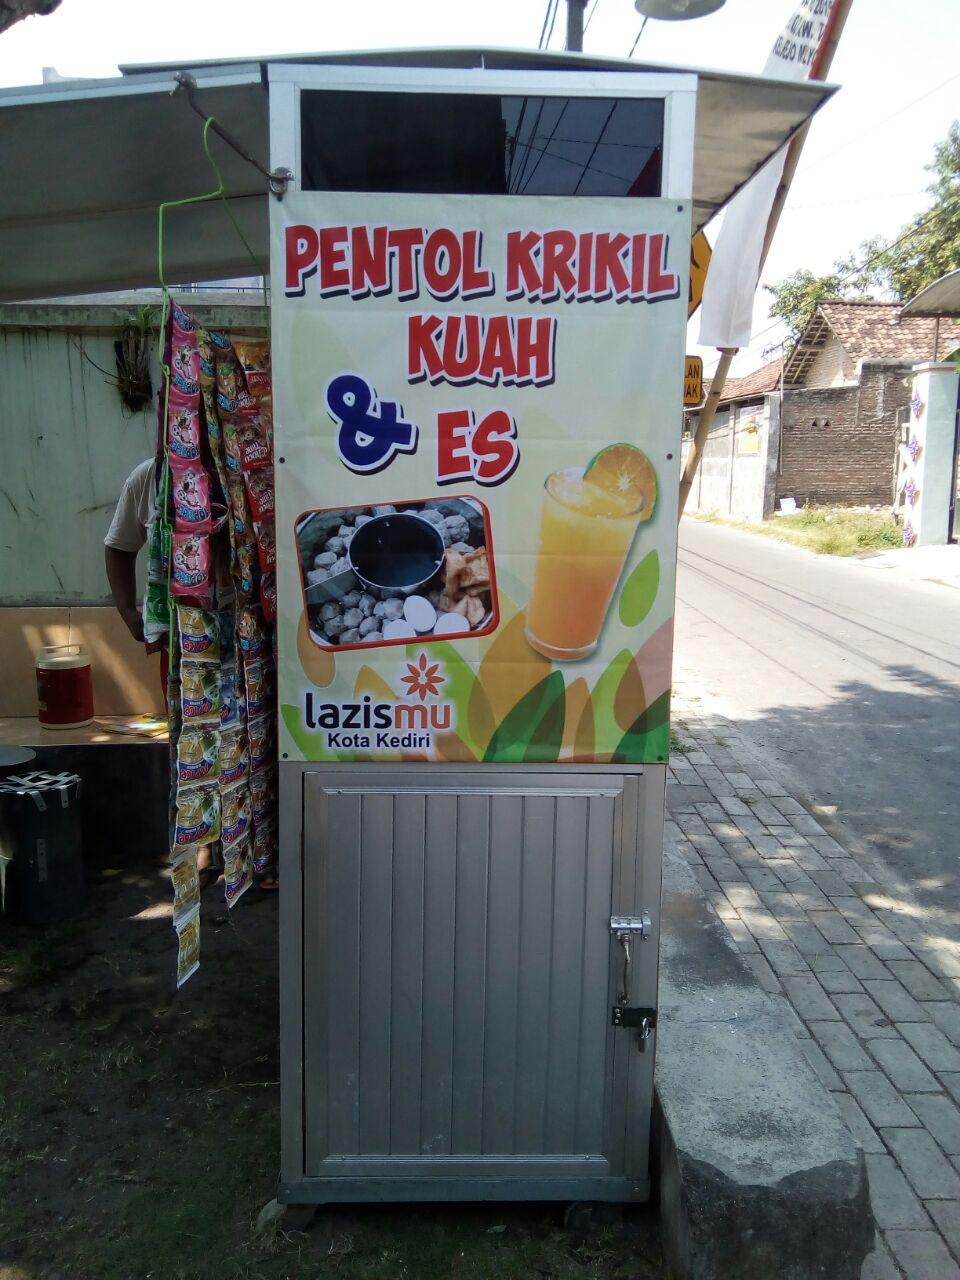 Contoh Banner Jualan Pentol - desain banner kekinian